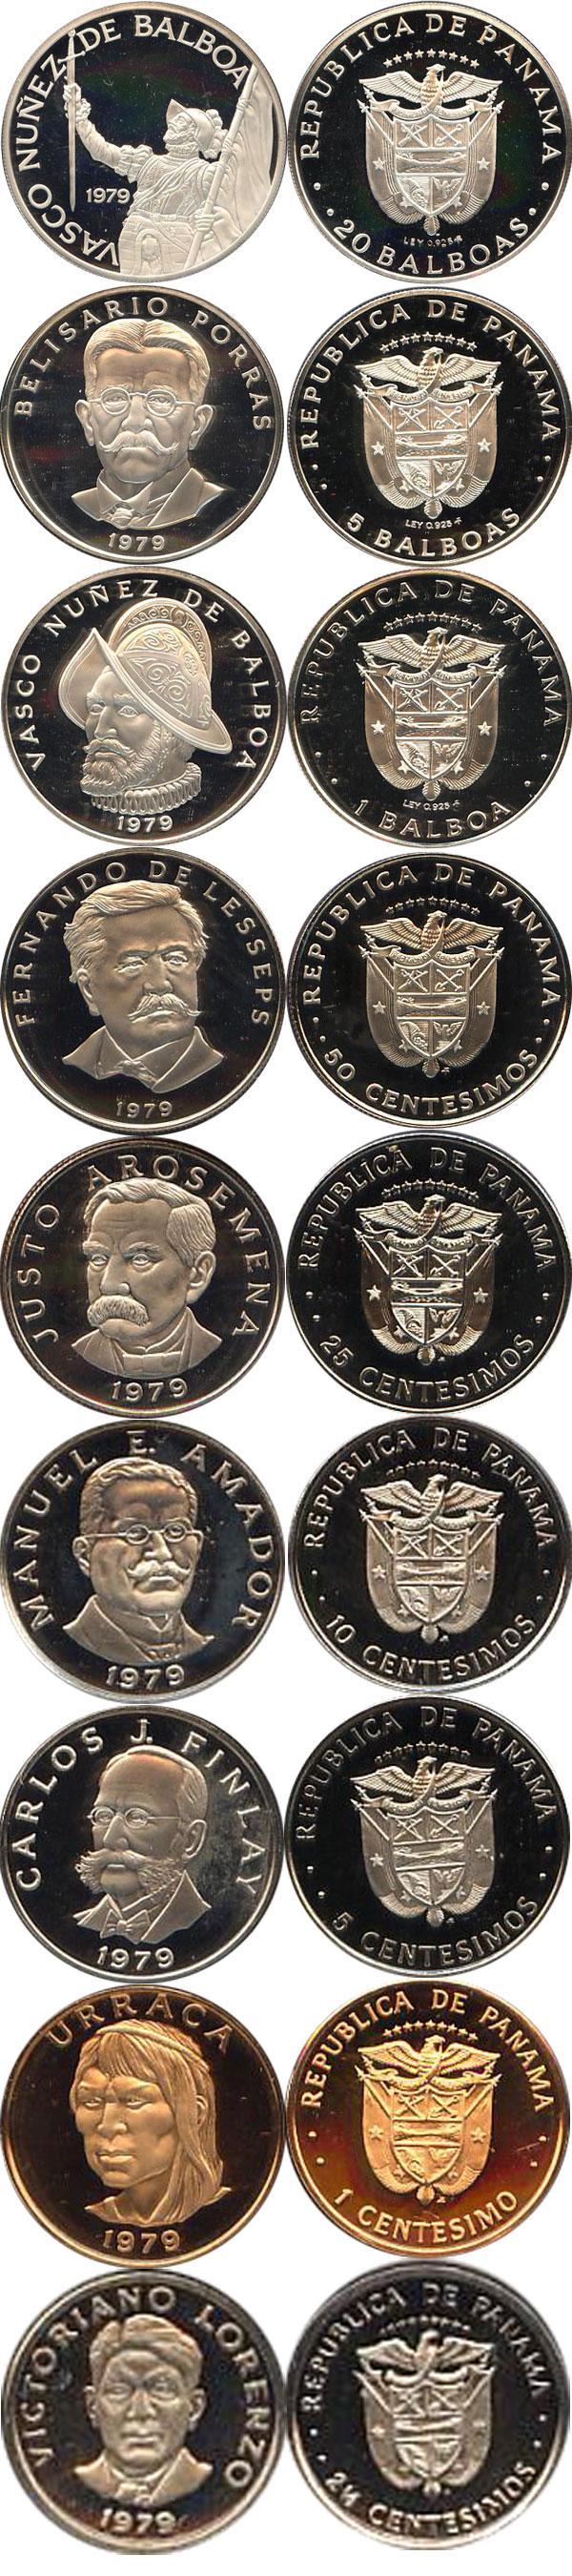 Каталог монет - Панама Васко Нуньес де Бальбоа